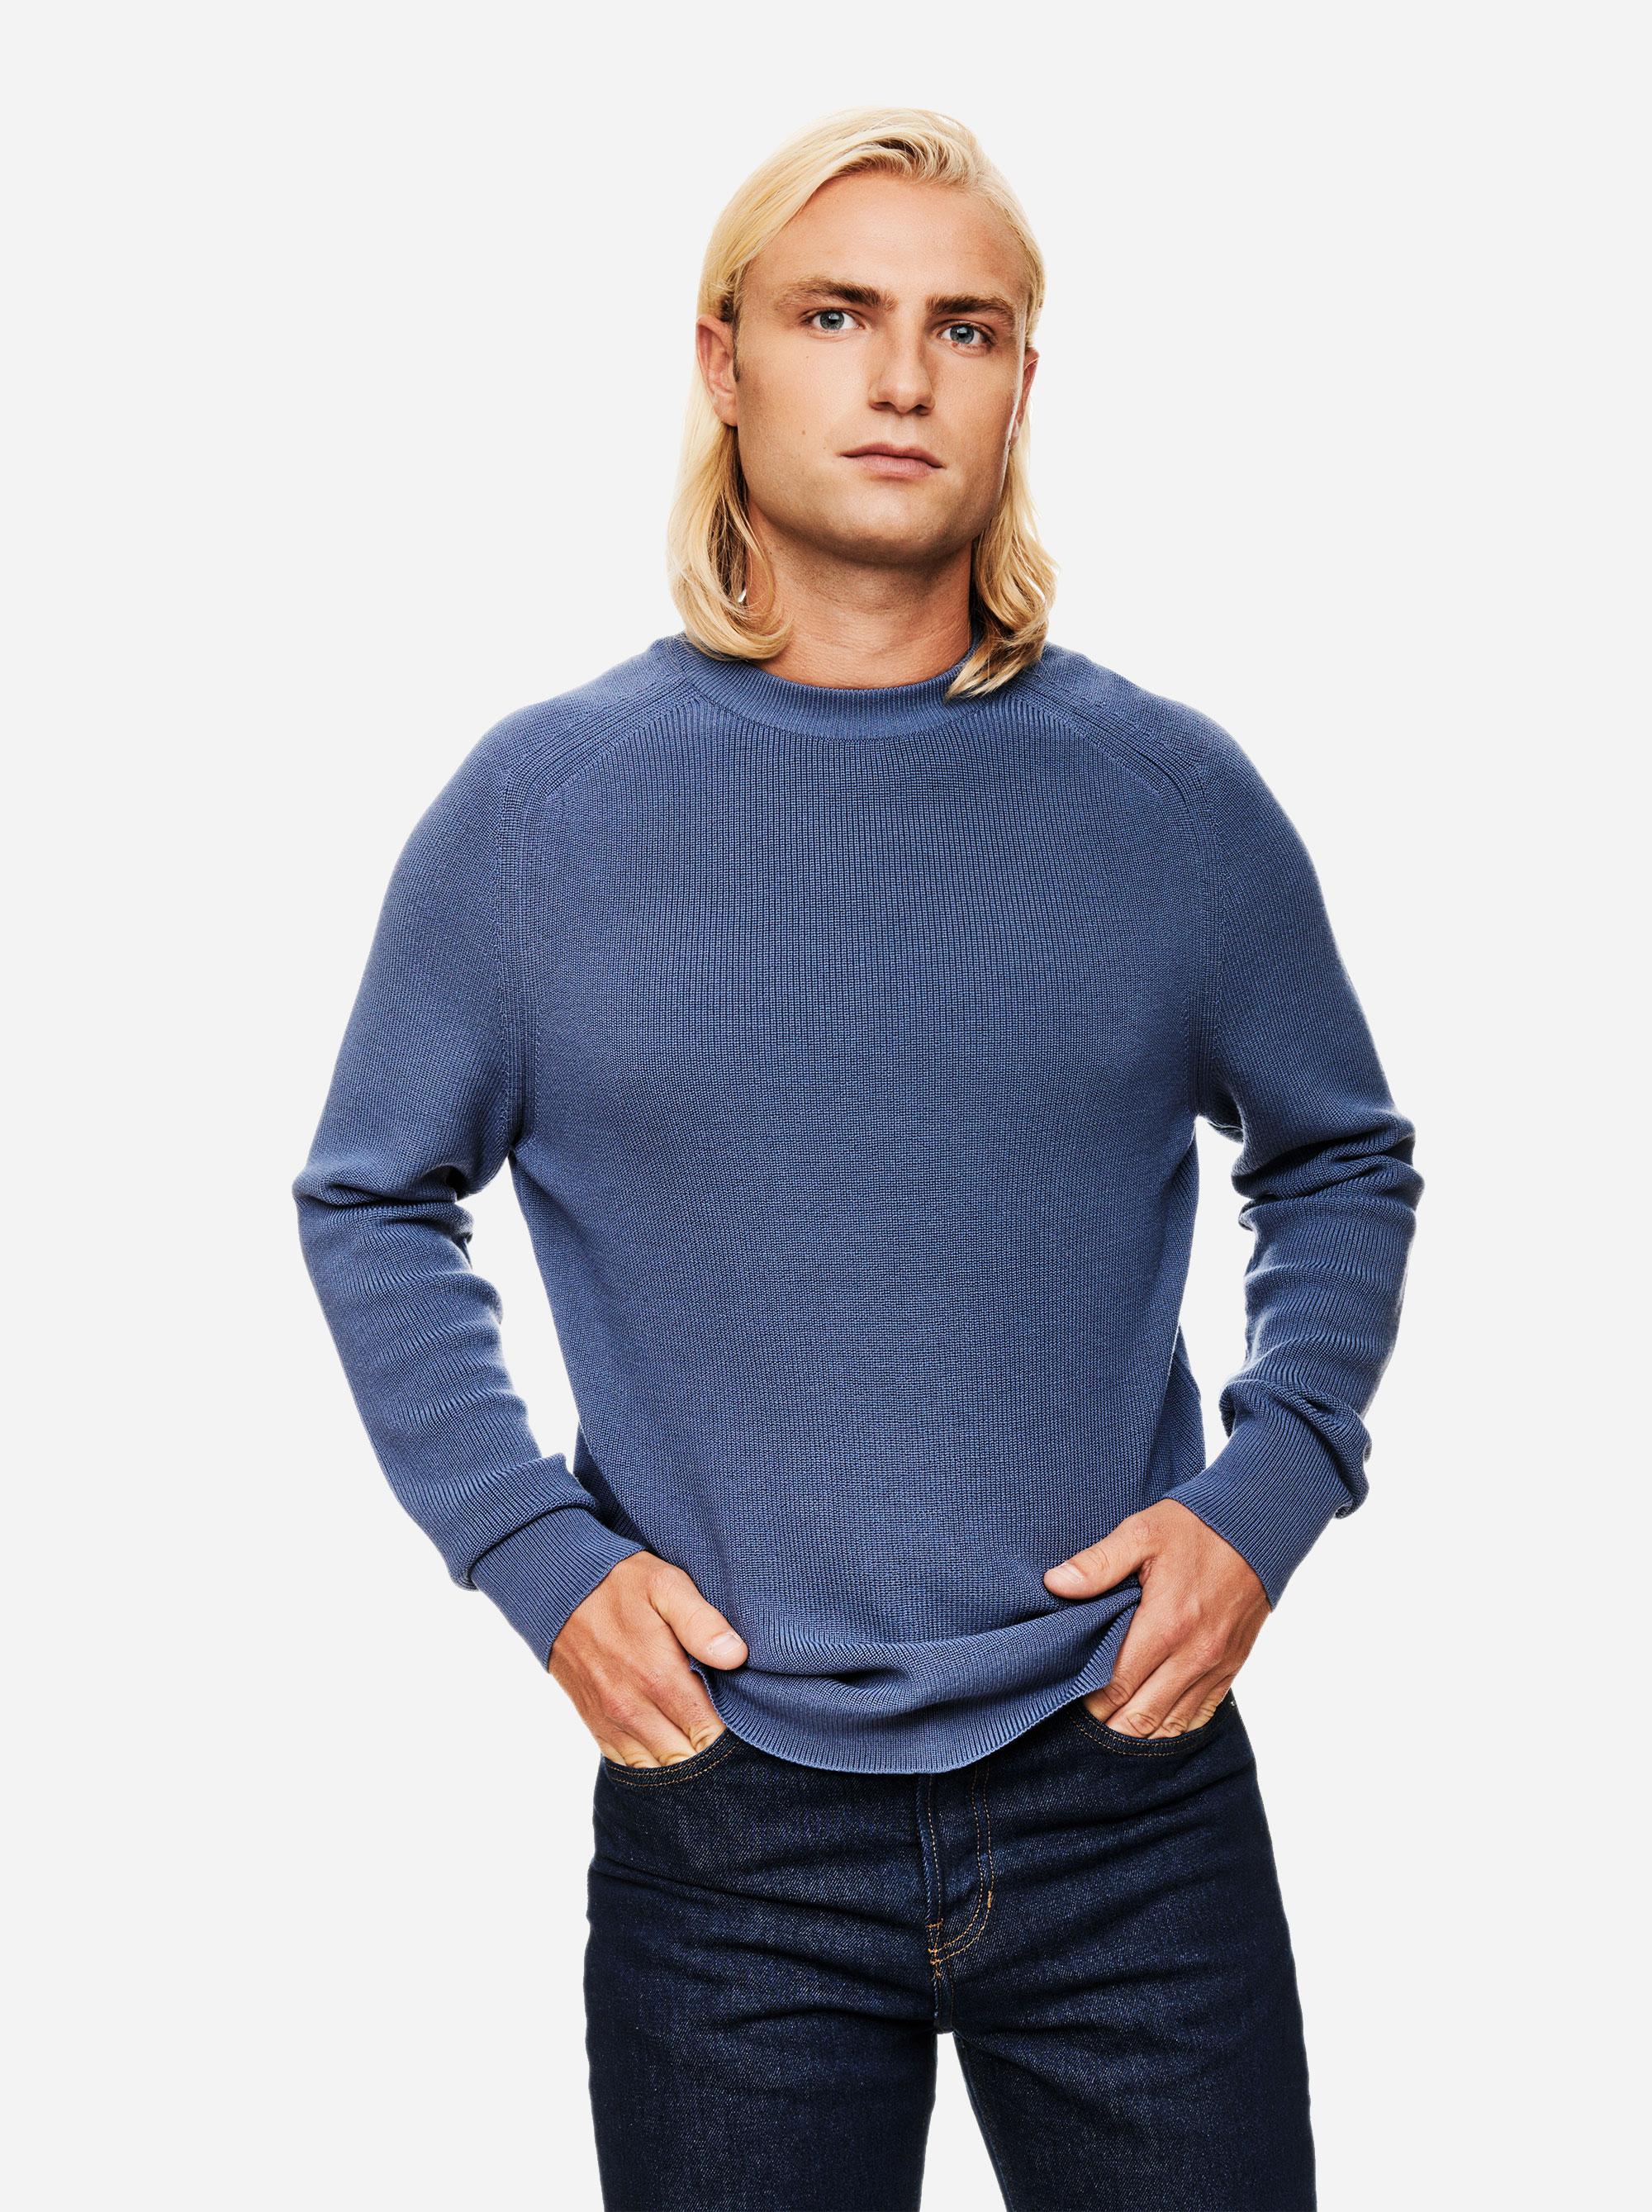 Teym - The Merino Sweater - Men - Sky blue - 2